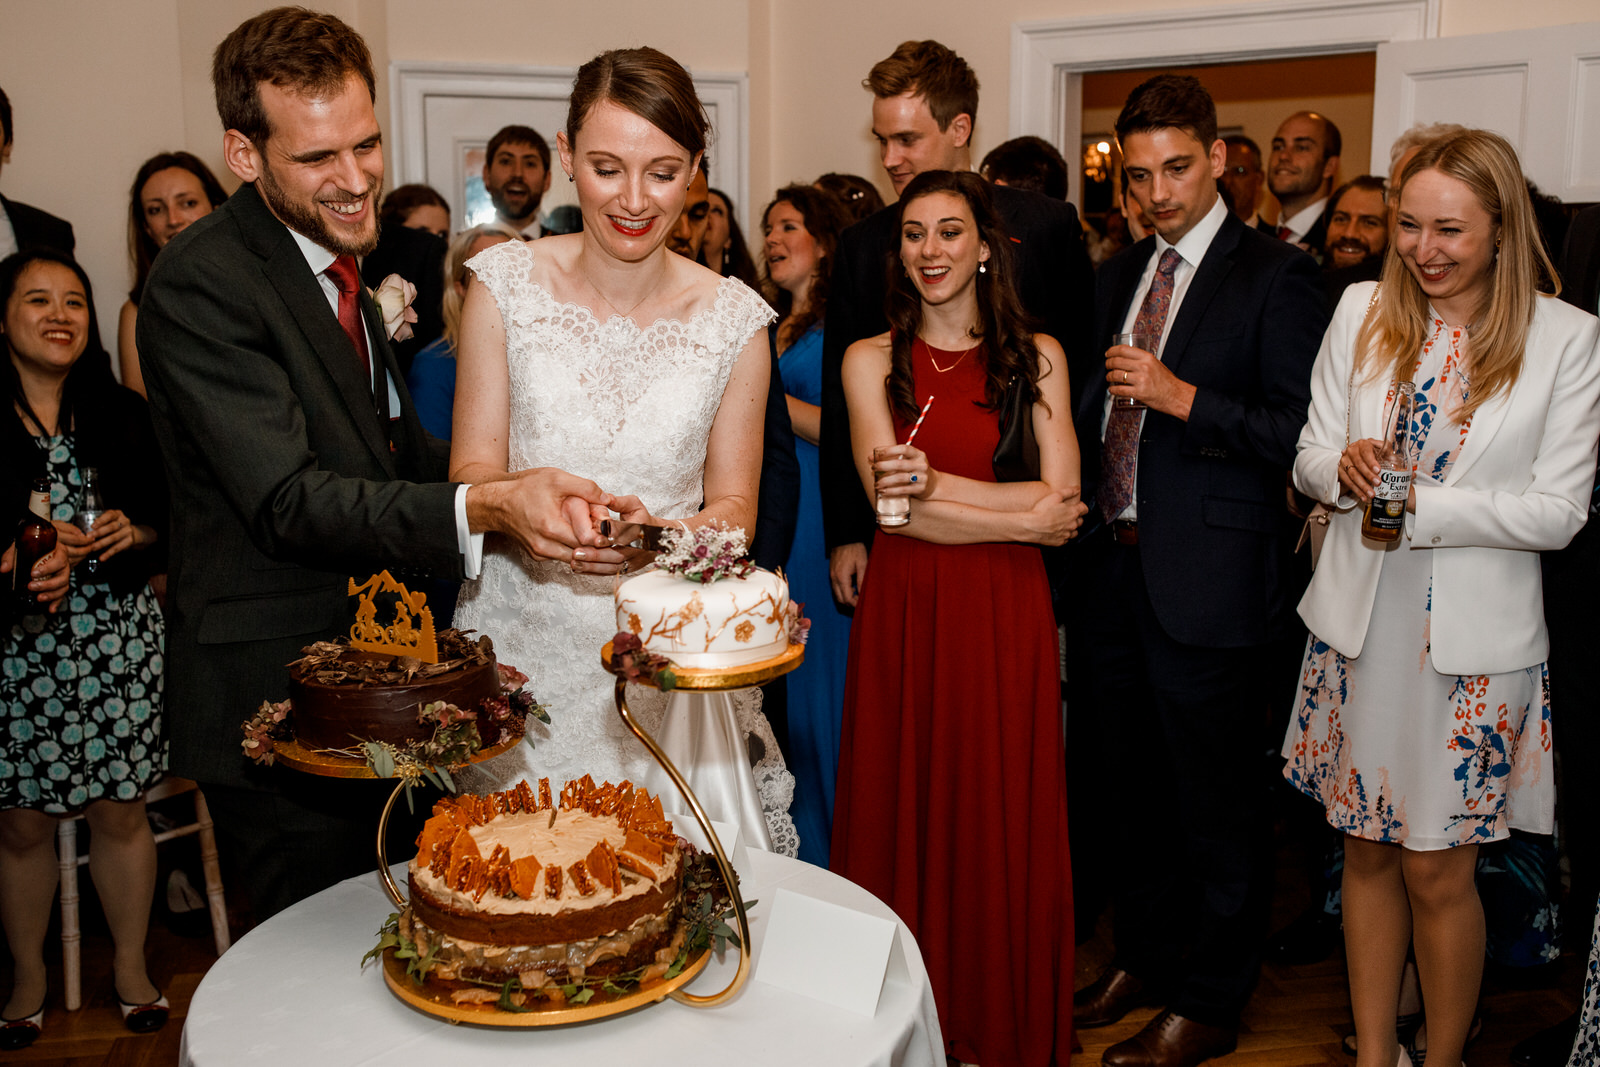 wedding cake cut at richmond park wedding